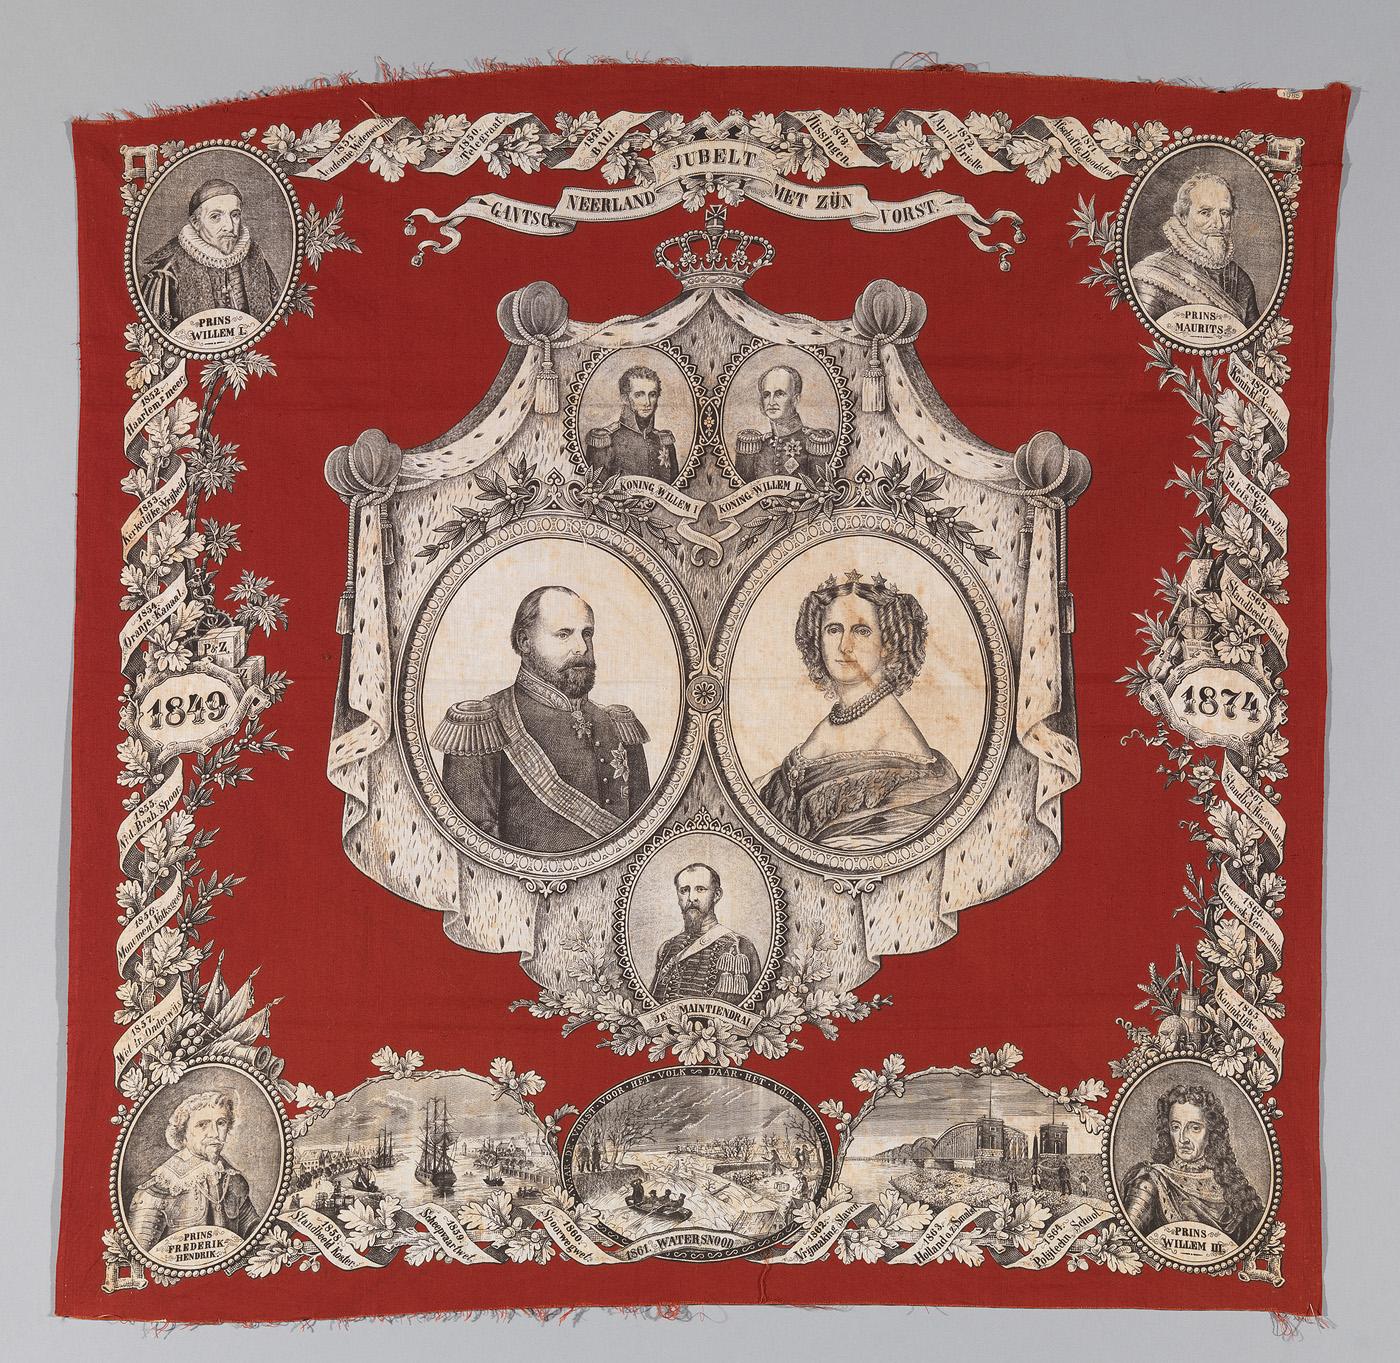 Doek t.g.v. 25-jarig regeringsjubileum koning Willem III en koningin Sophie